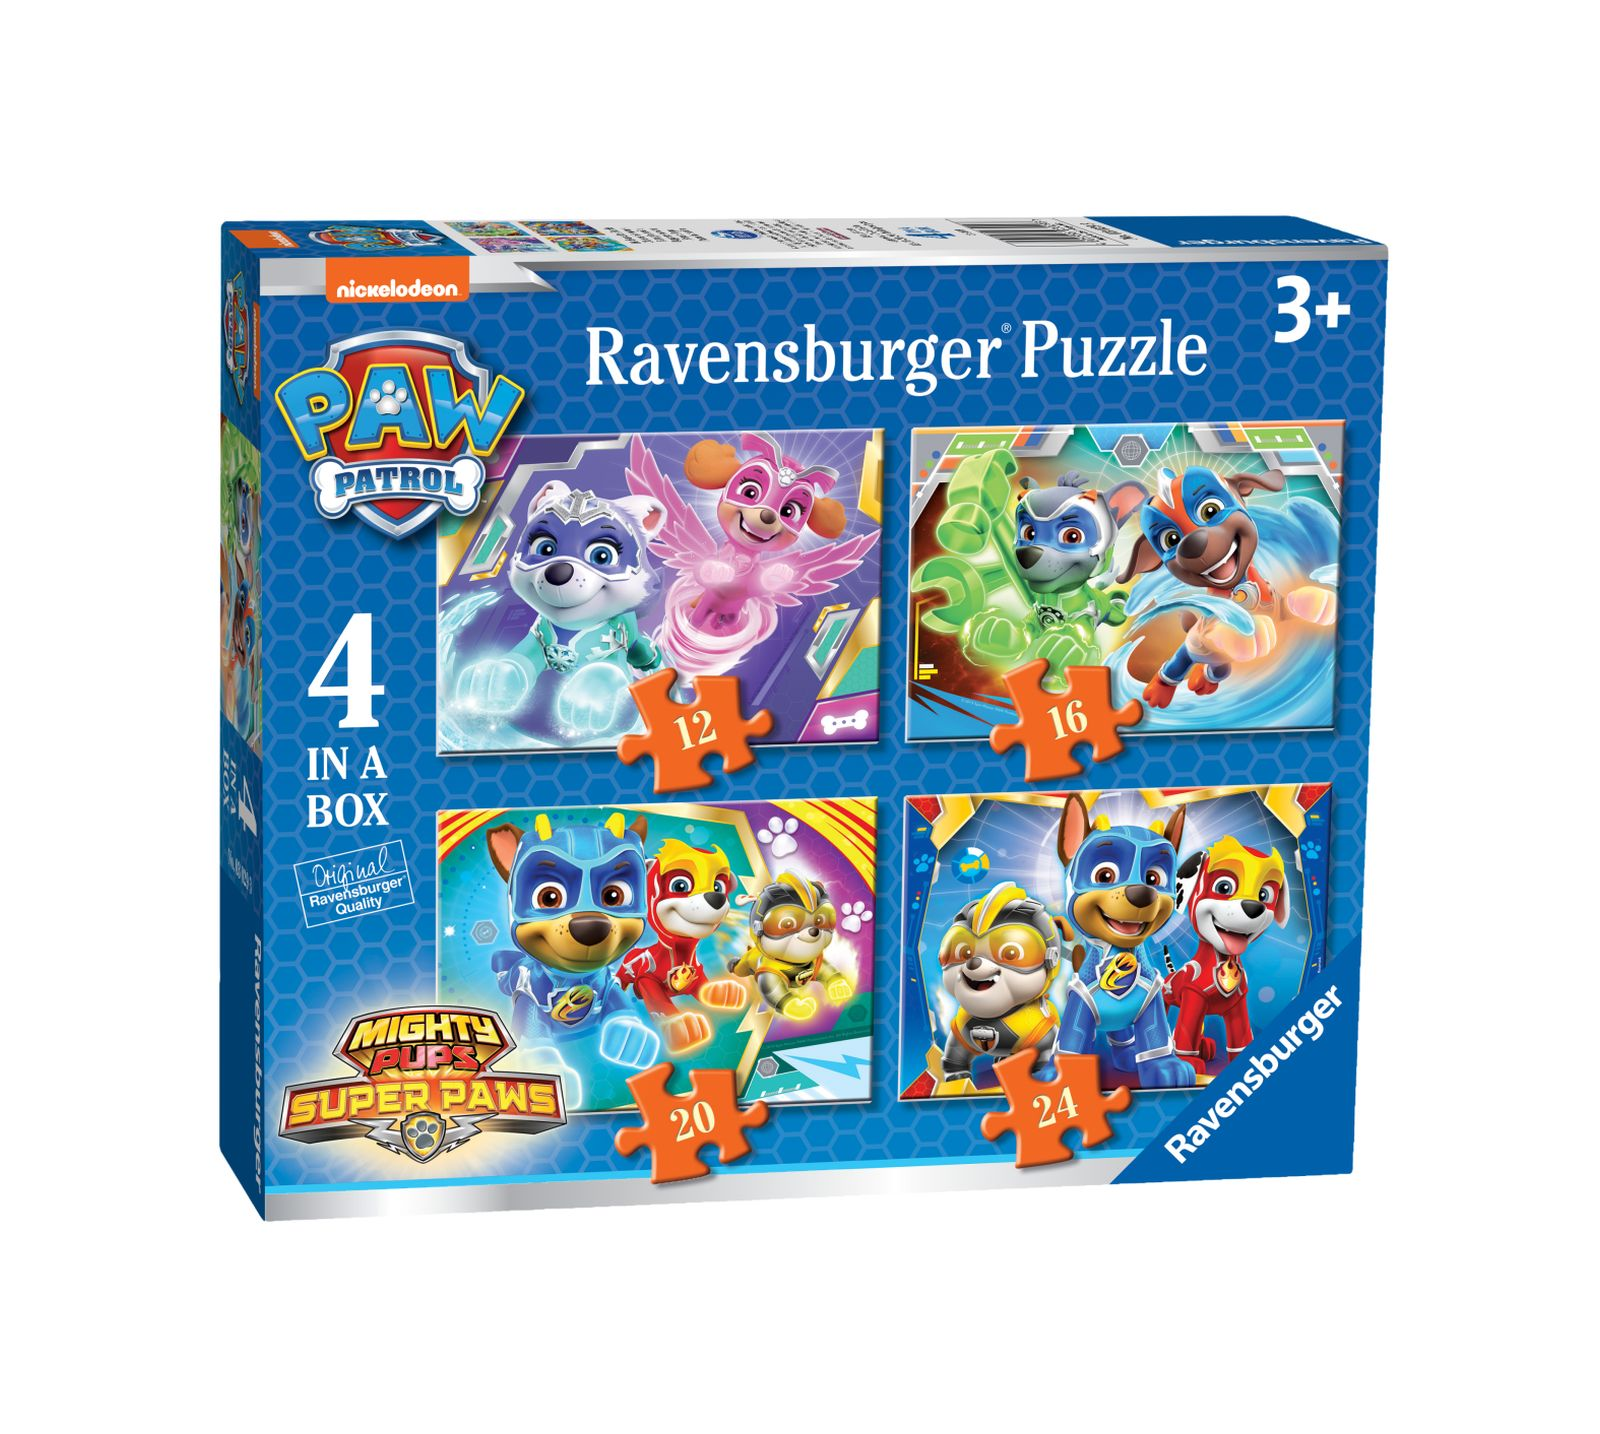 Ravensburger - 4 in a box - paw patrol - Ravensburger1